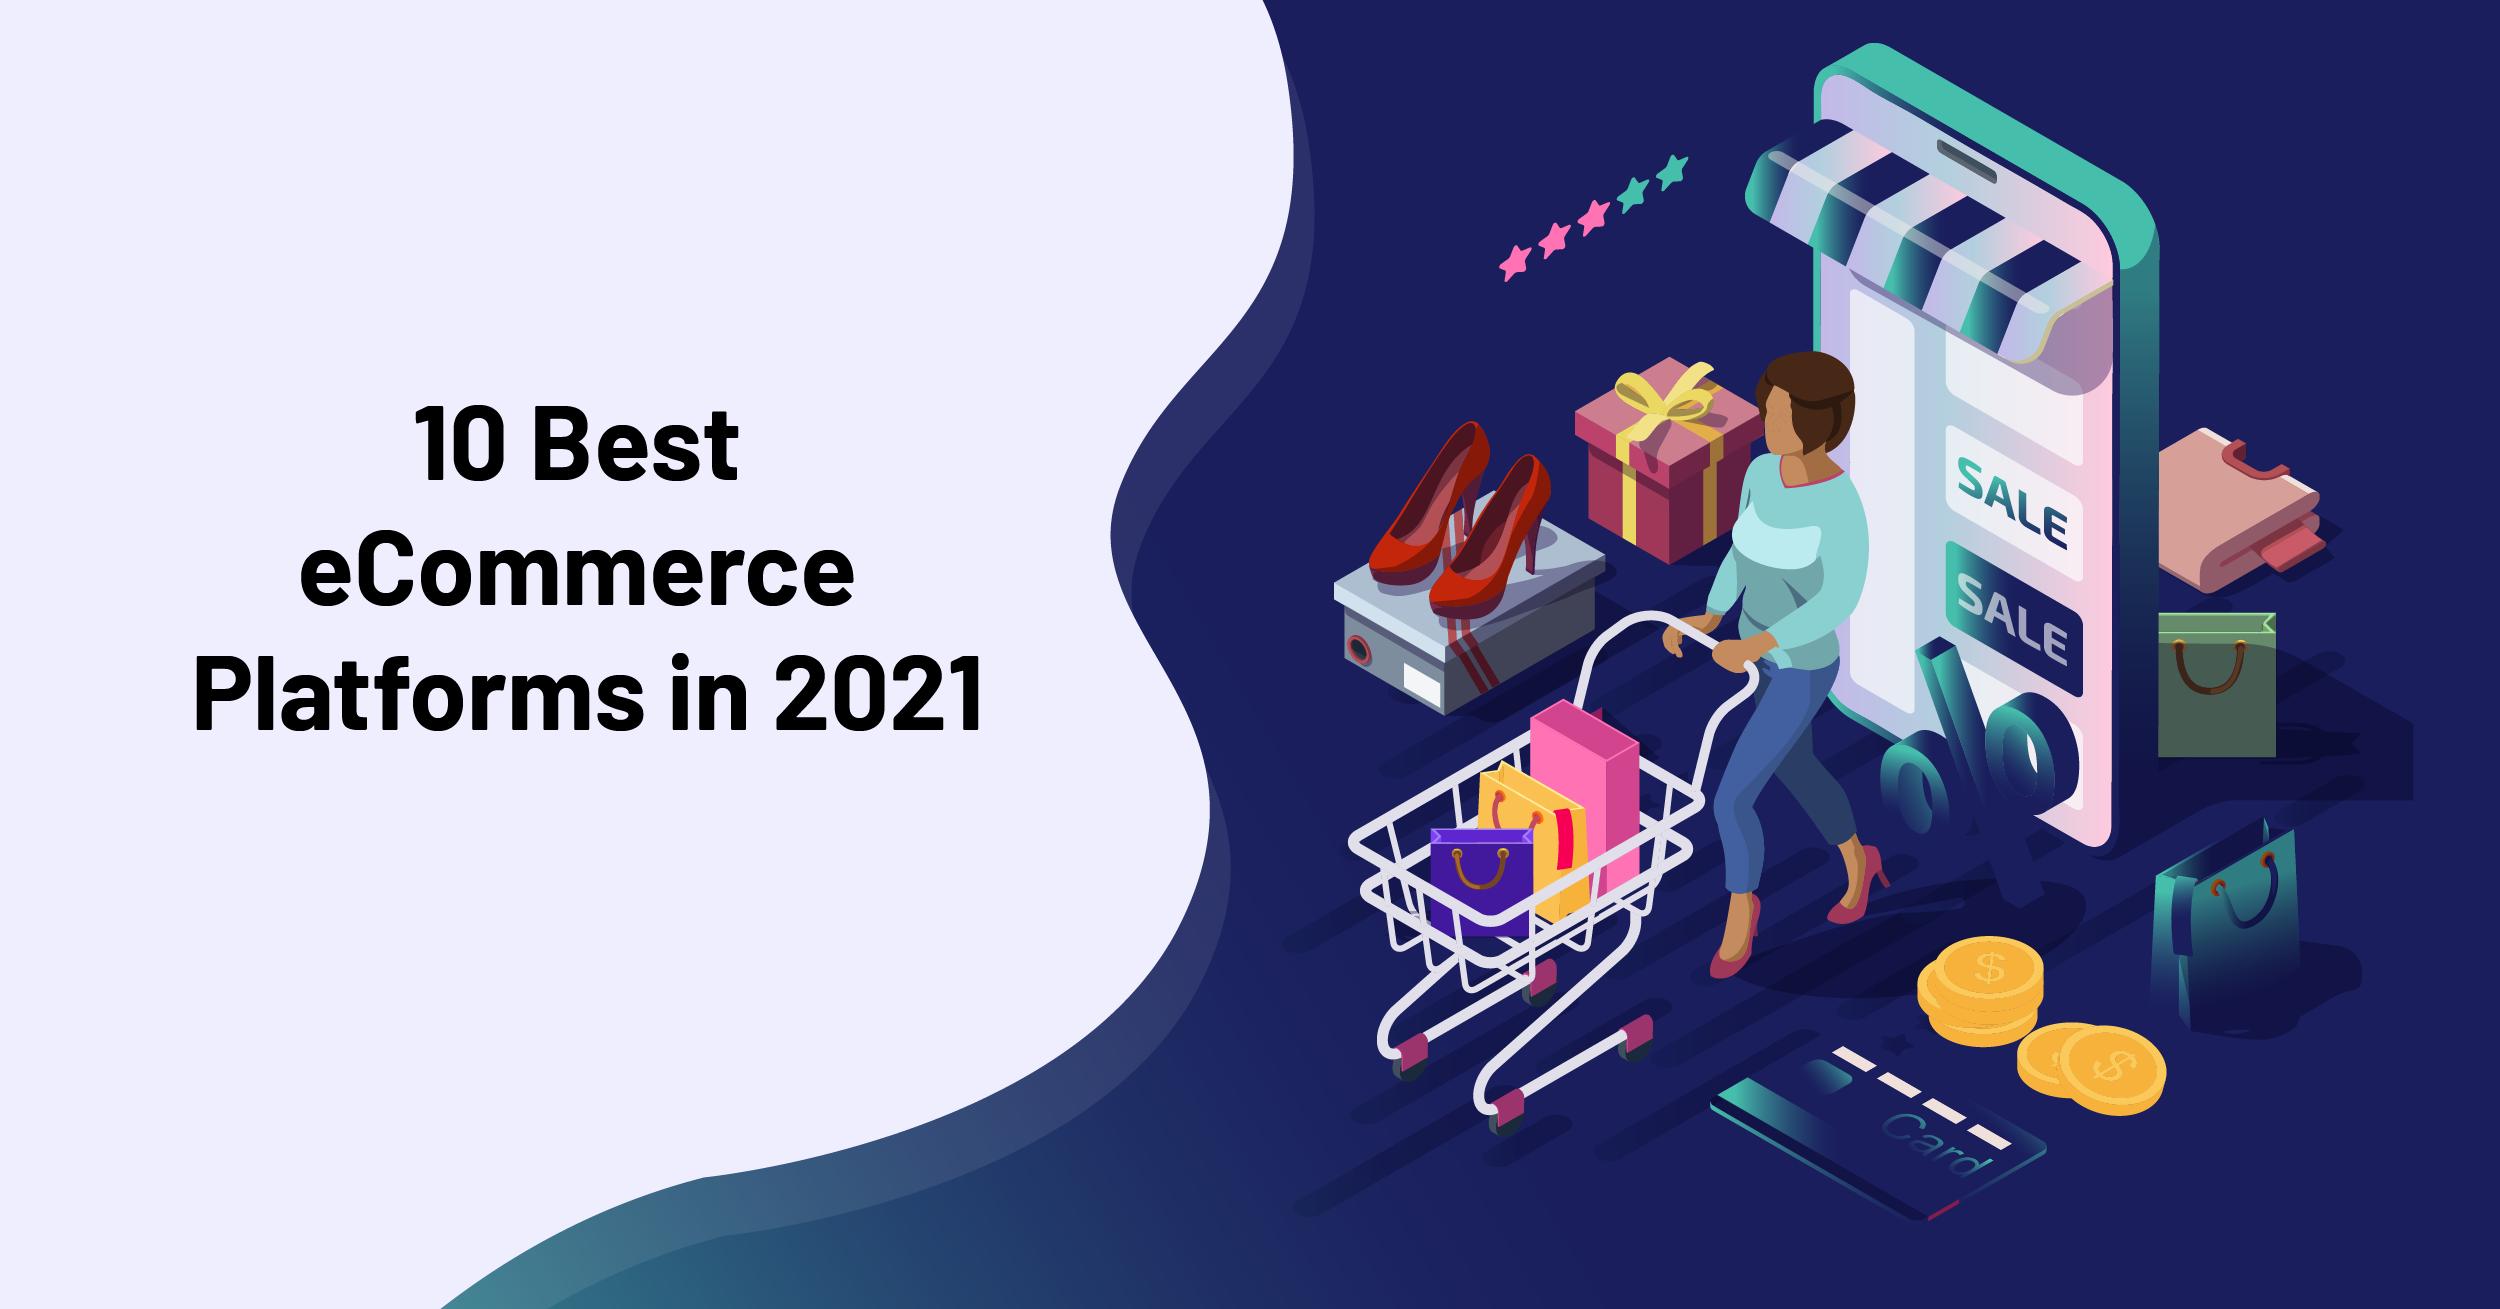 10 Best eCommerce Platforms in 2021